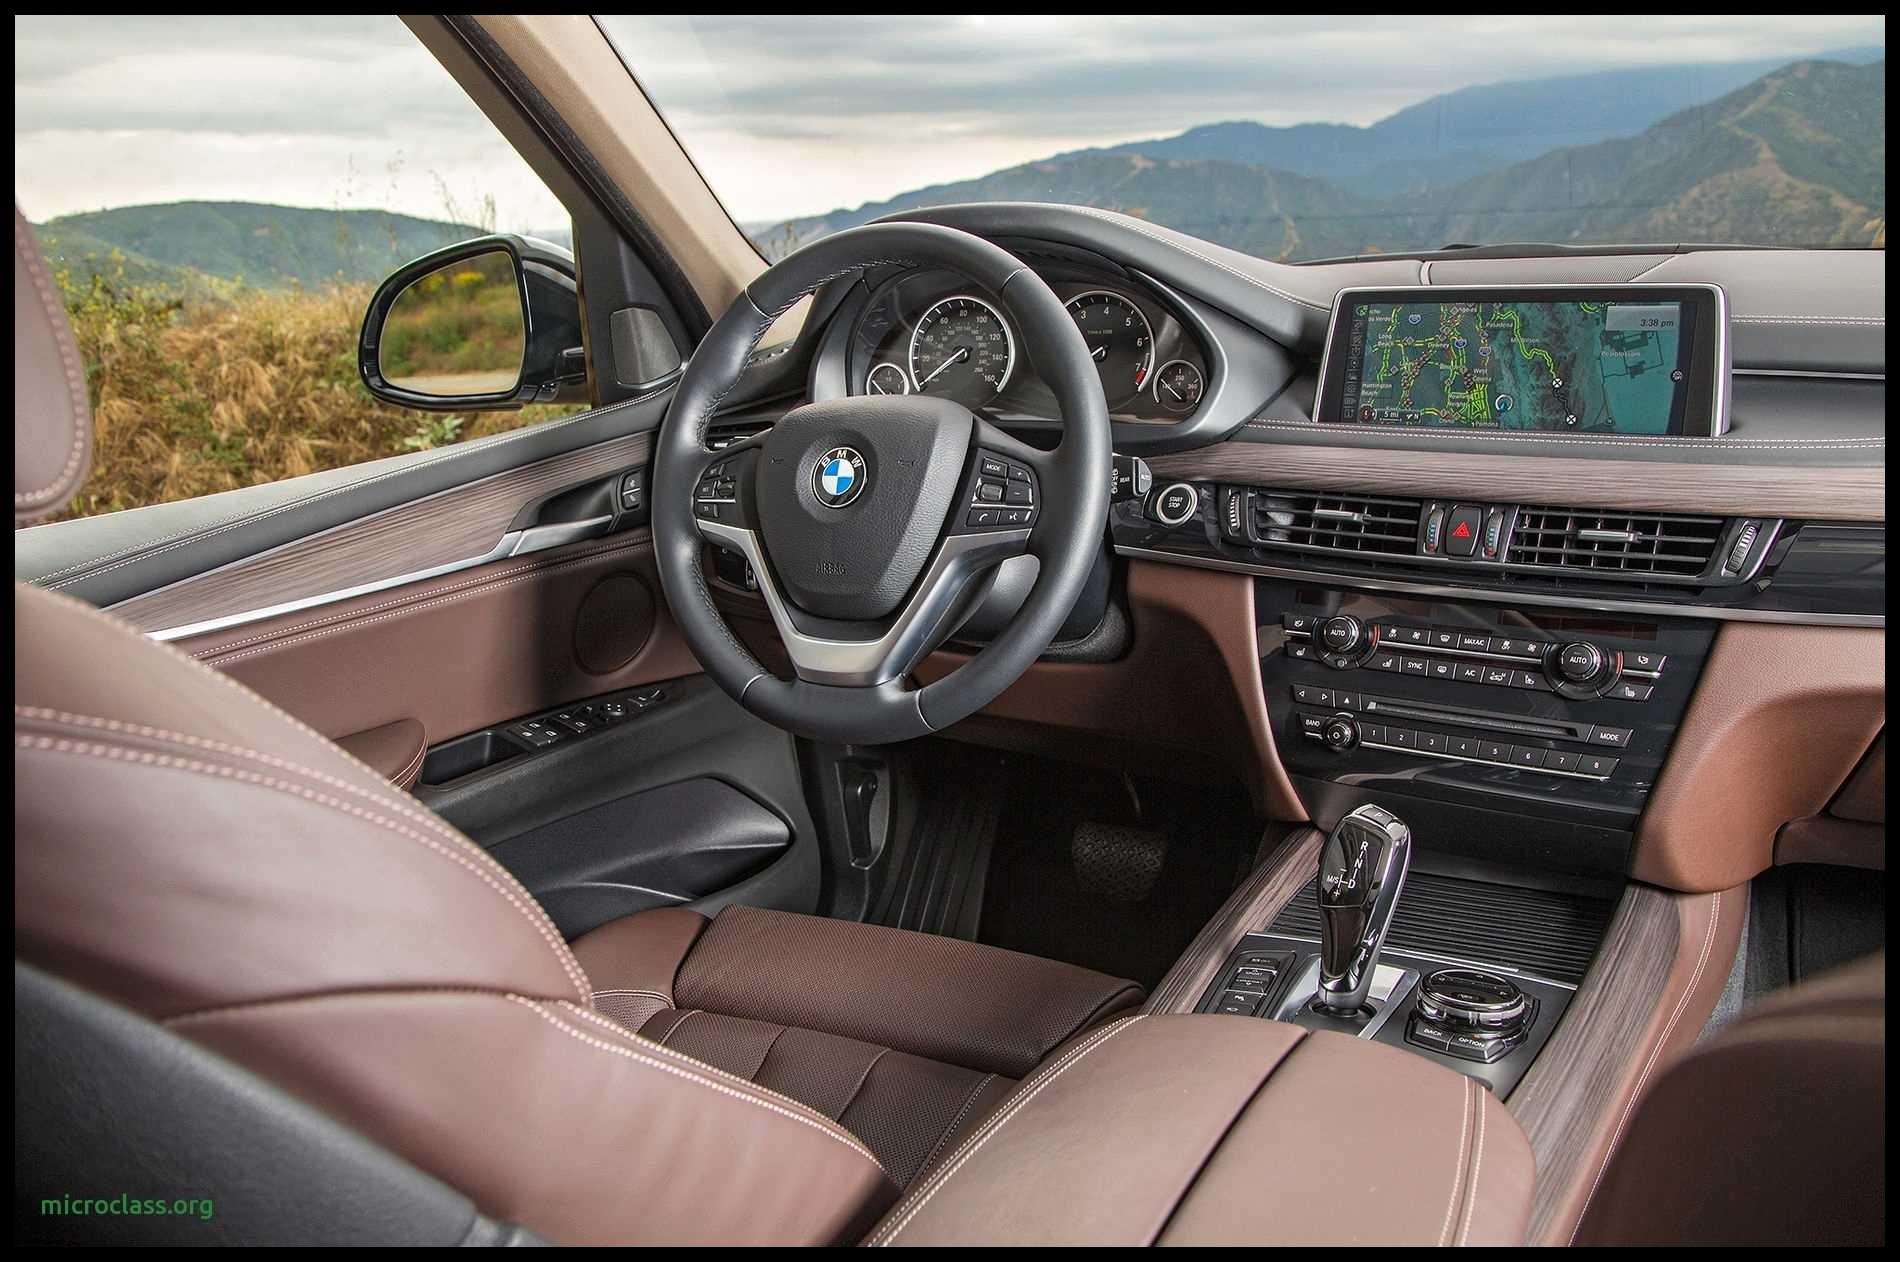 Bmw X5 2018 Interior Colors Bmw 2018 Exterior Colors 8 8 Luxury 2019 Bmw X5